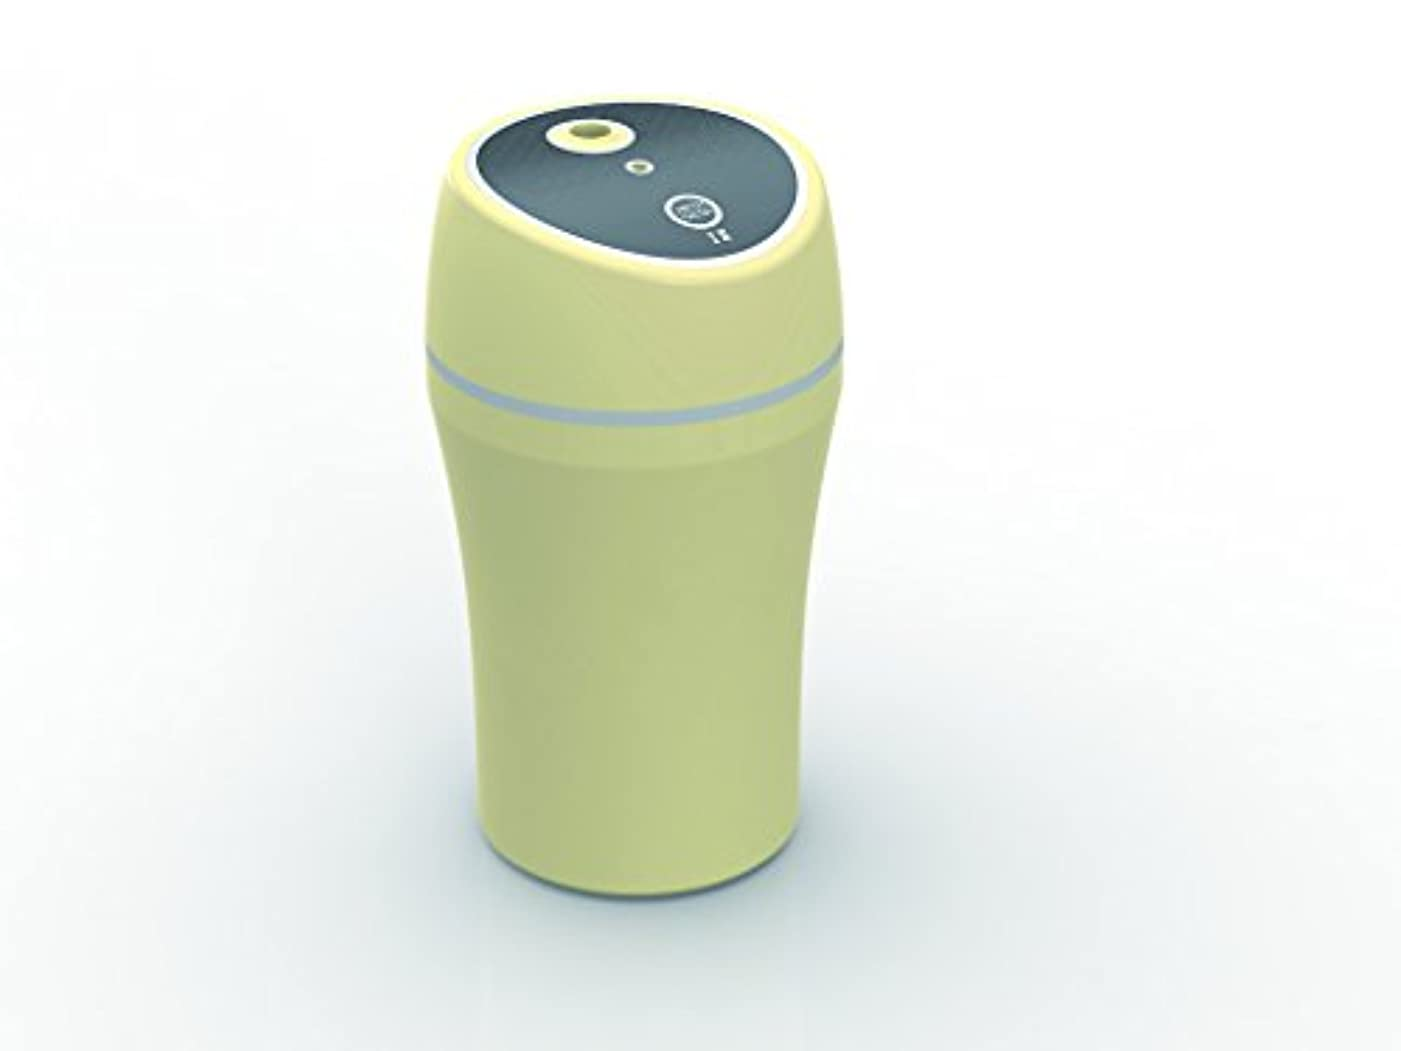 KEIYO 車でもオフィスでも自宅でも!DC/USB 2WAY対応 超音波式 USBミニ加湿器 AN-S014 ROOM&CAR アロマディフューザー 車載用加湿器 ドリンクホルダー収納タイプ 超音波式加湿器 (ベージュ)